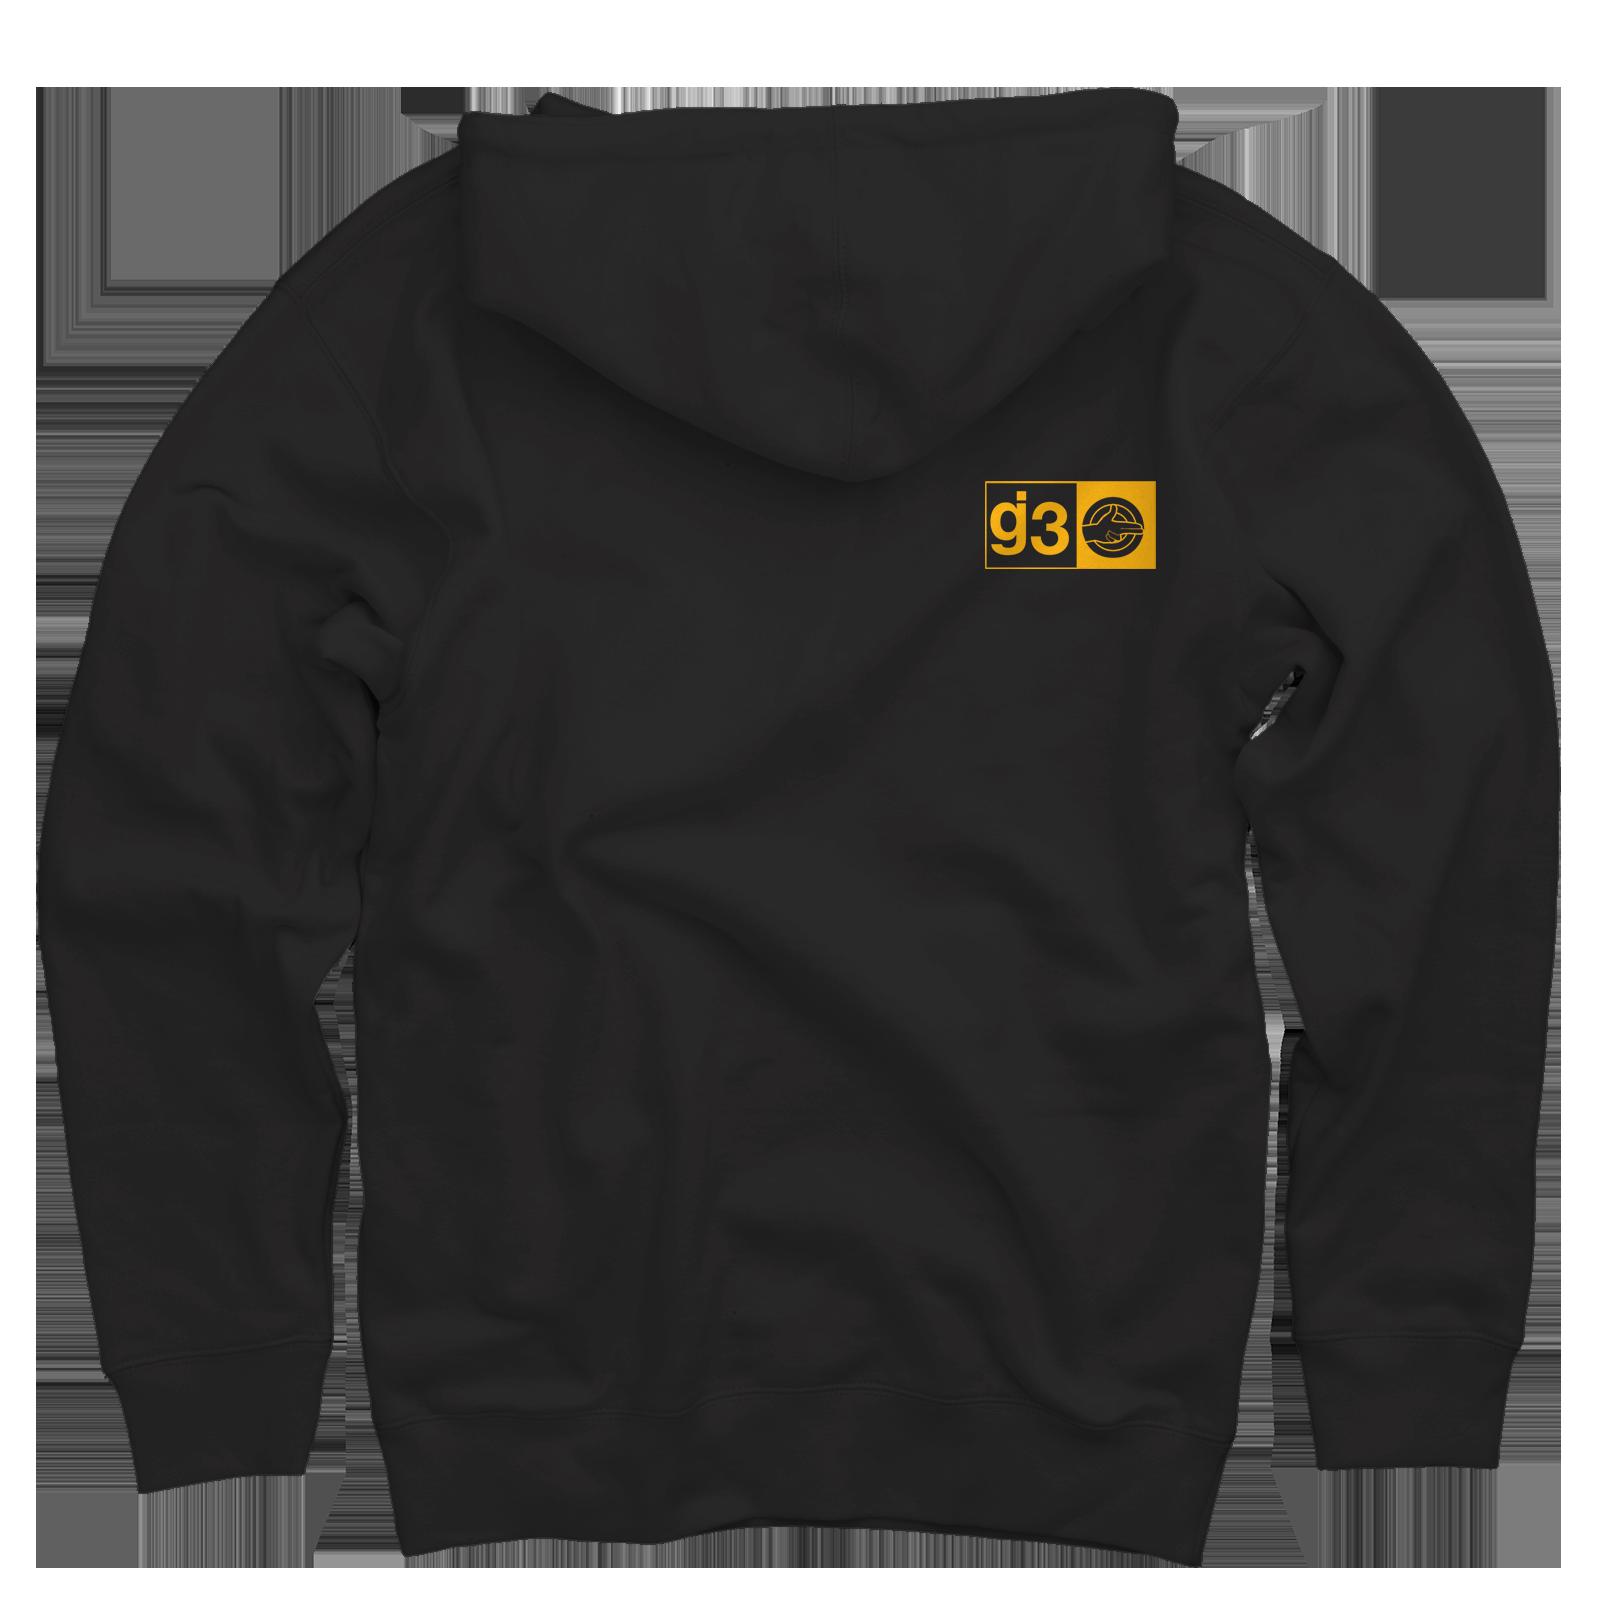 KKBB 1gg3 pullover black sweatshirt